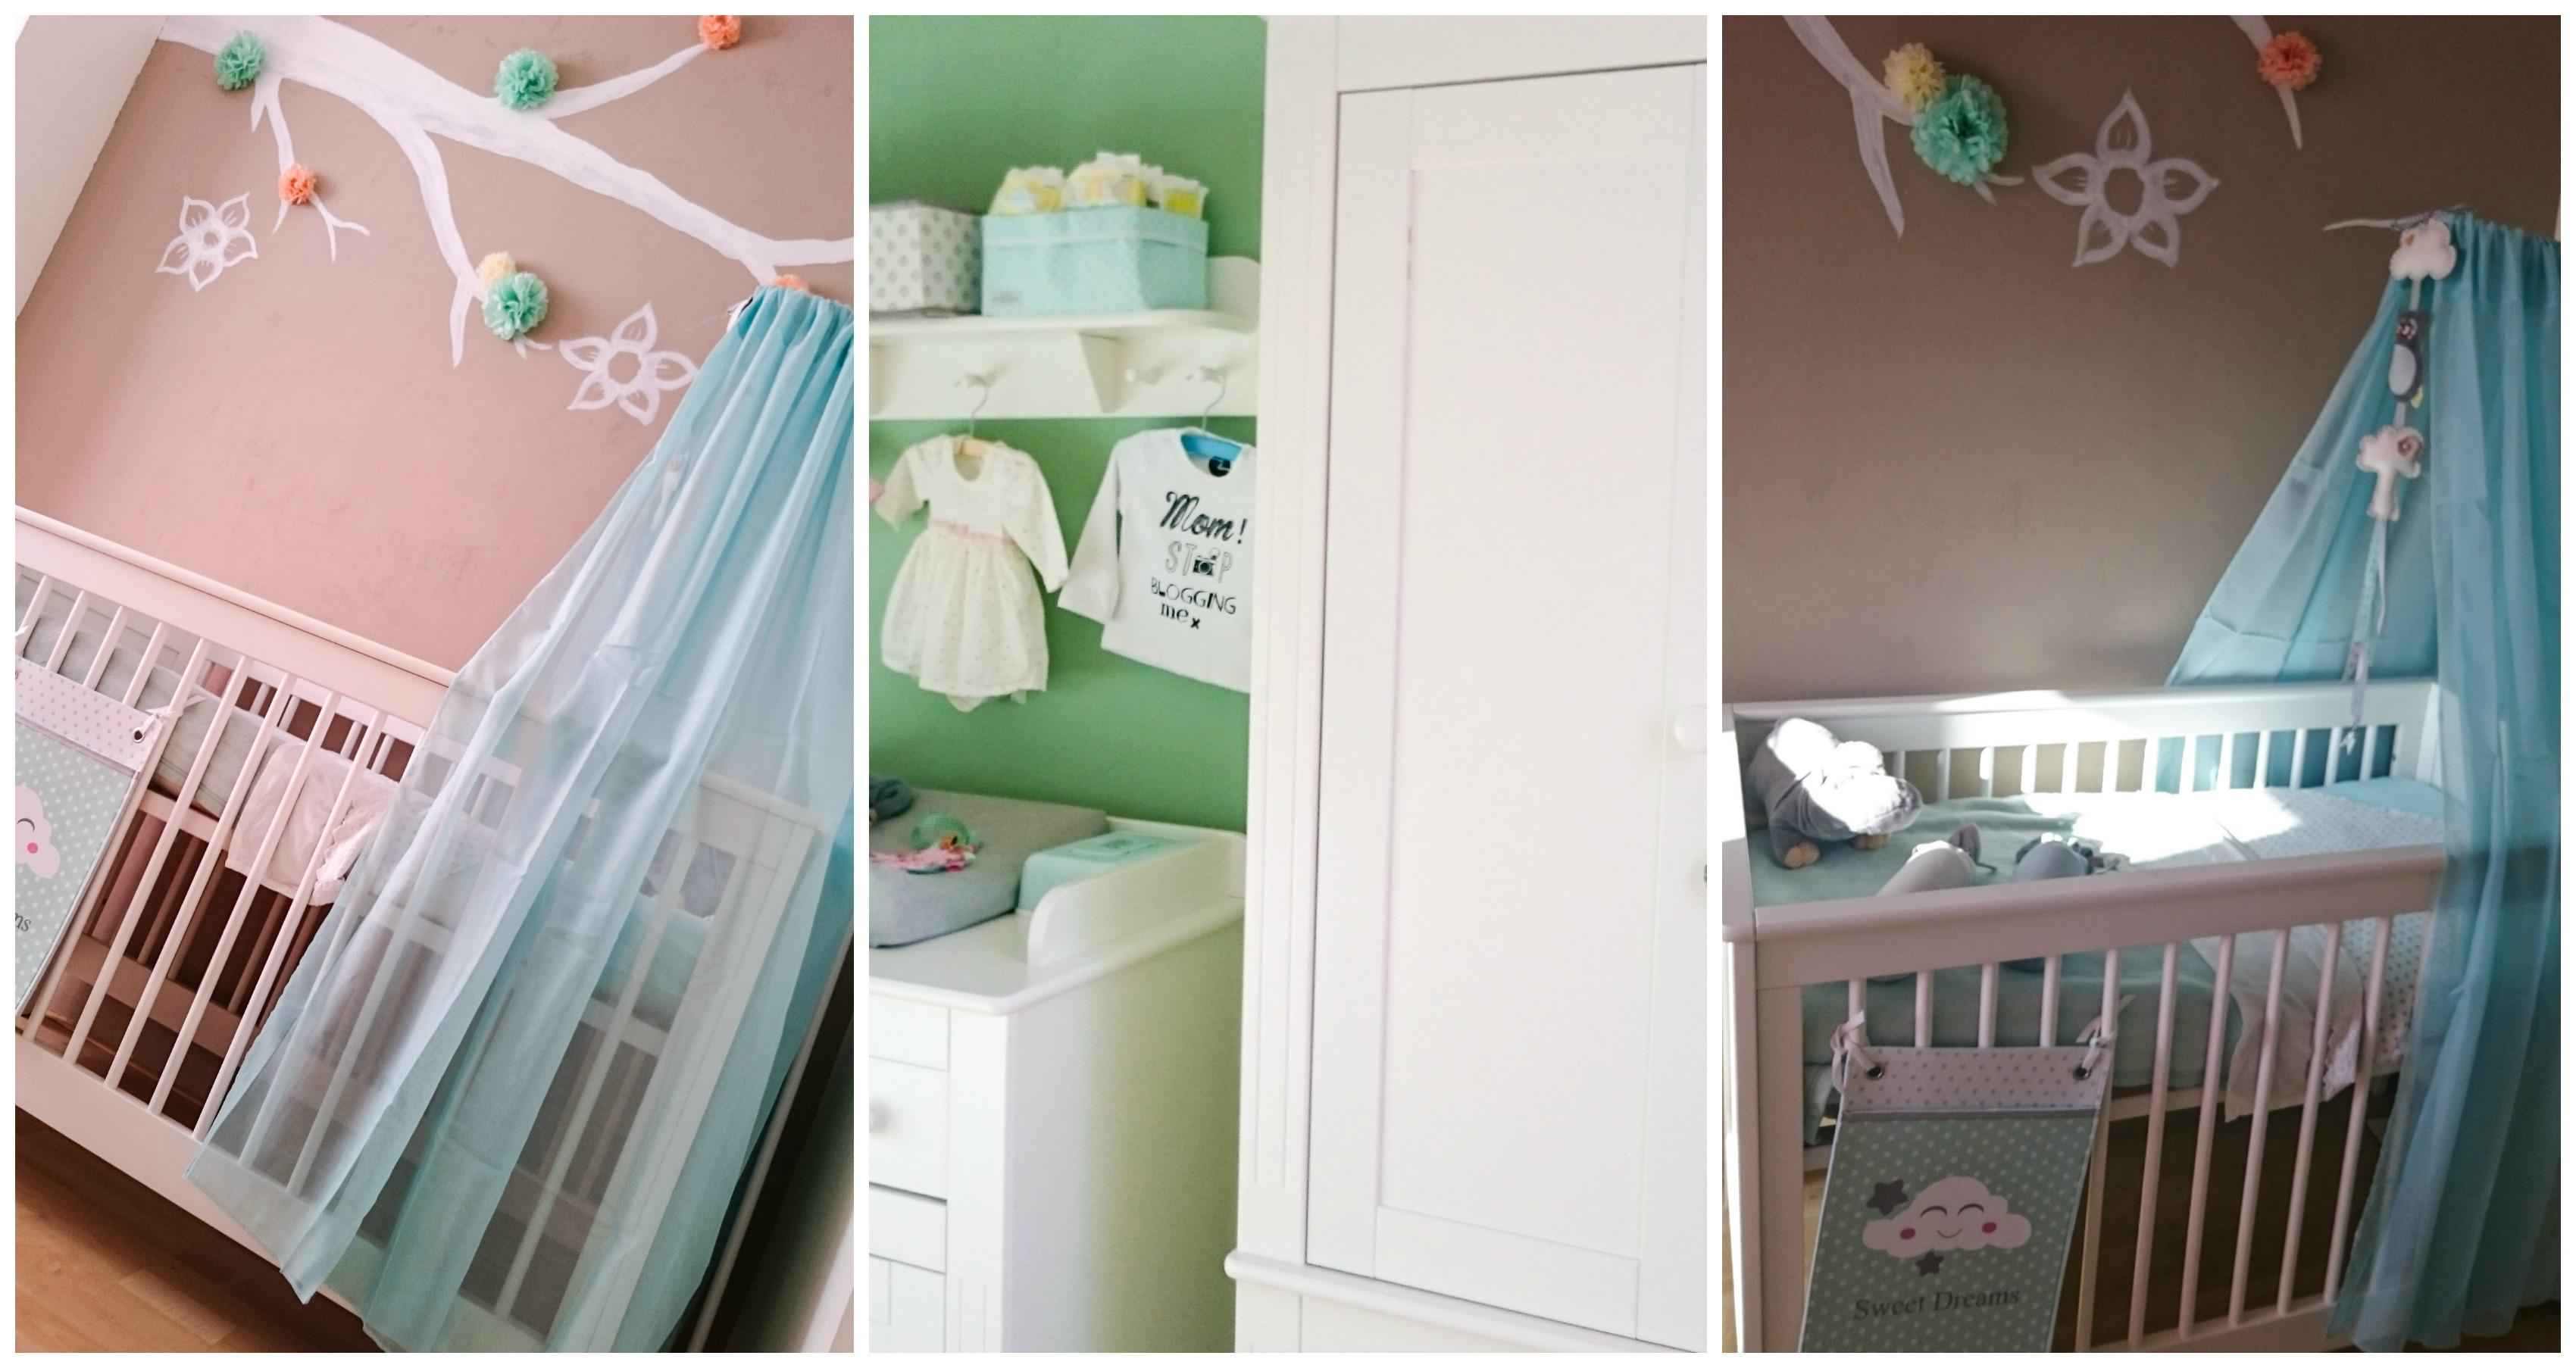 mijn babykamer - goodgirlscompany, Deco ideeën